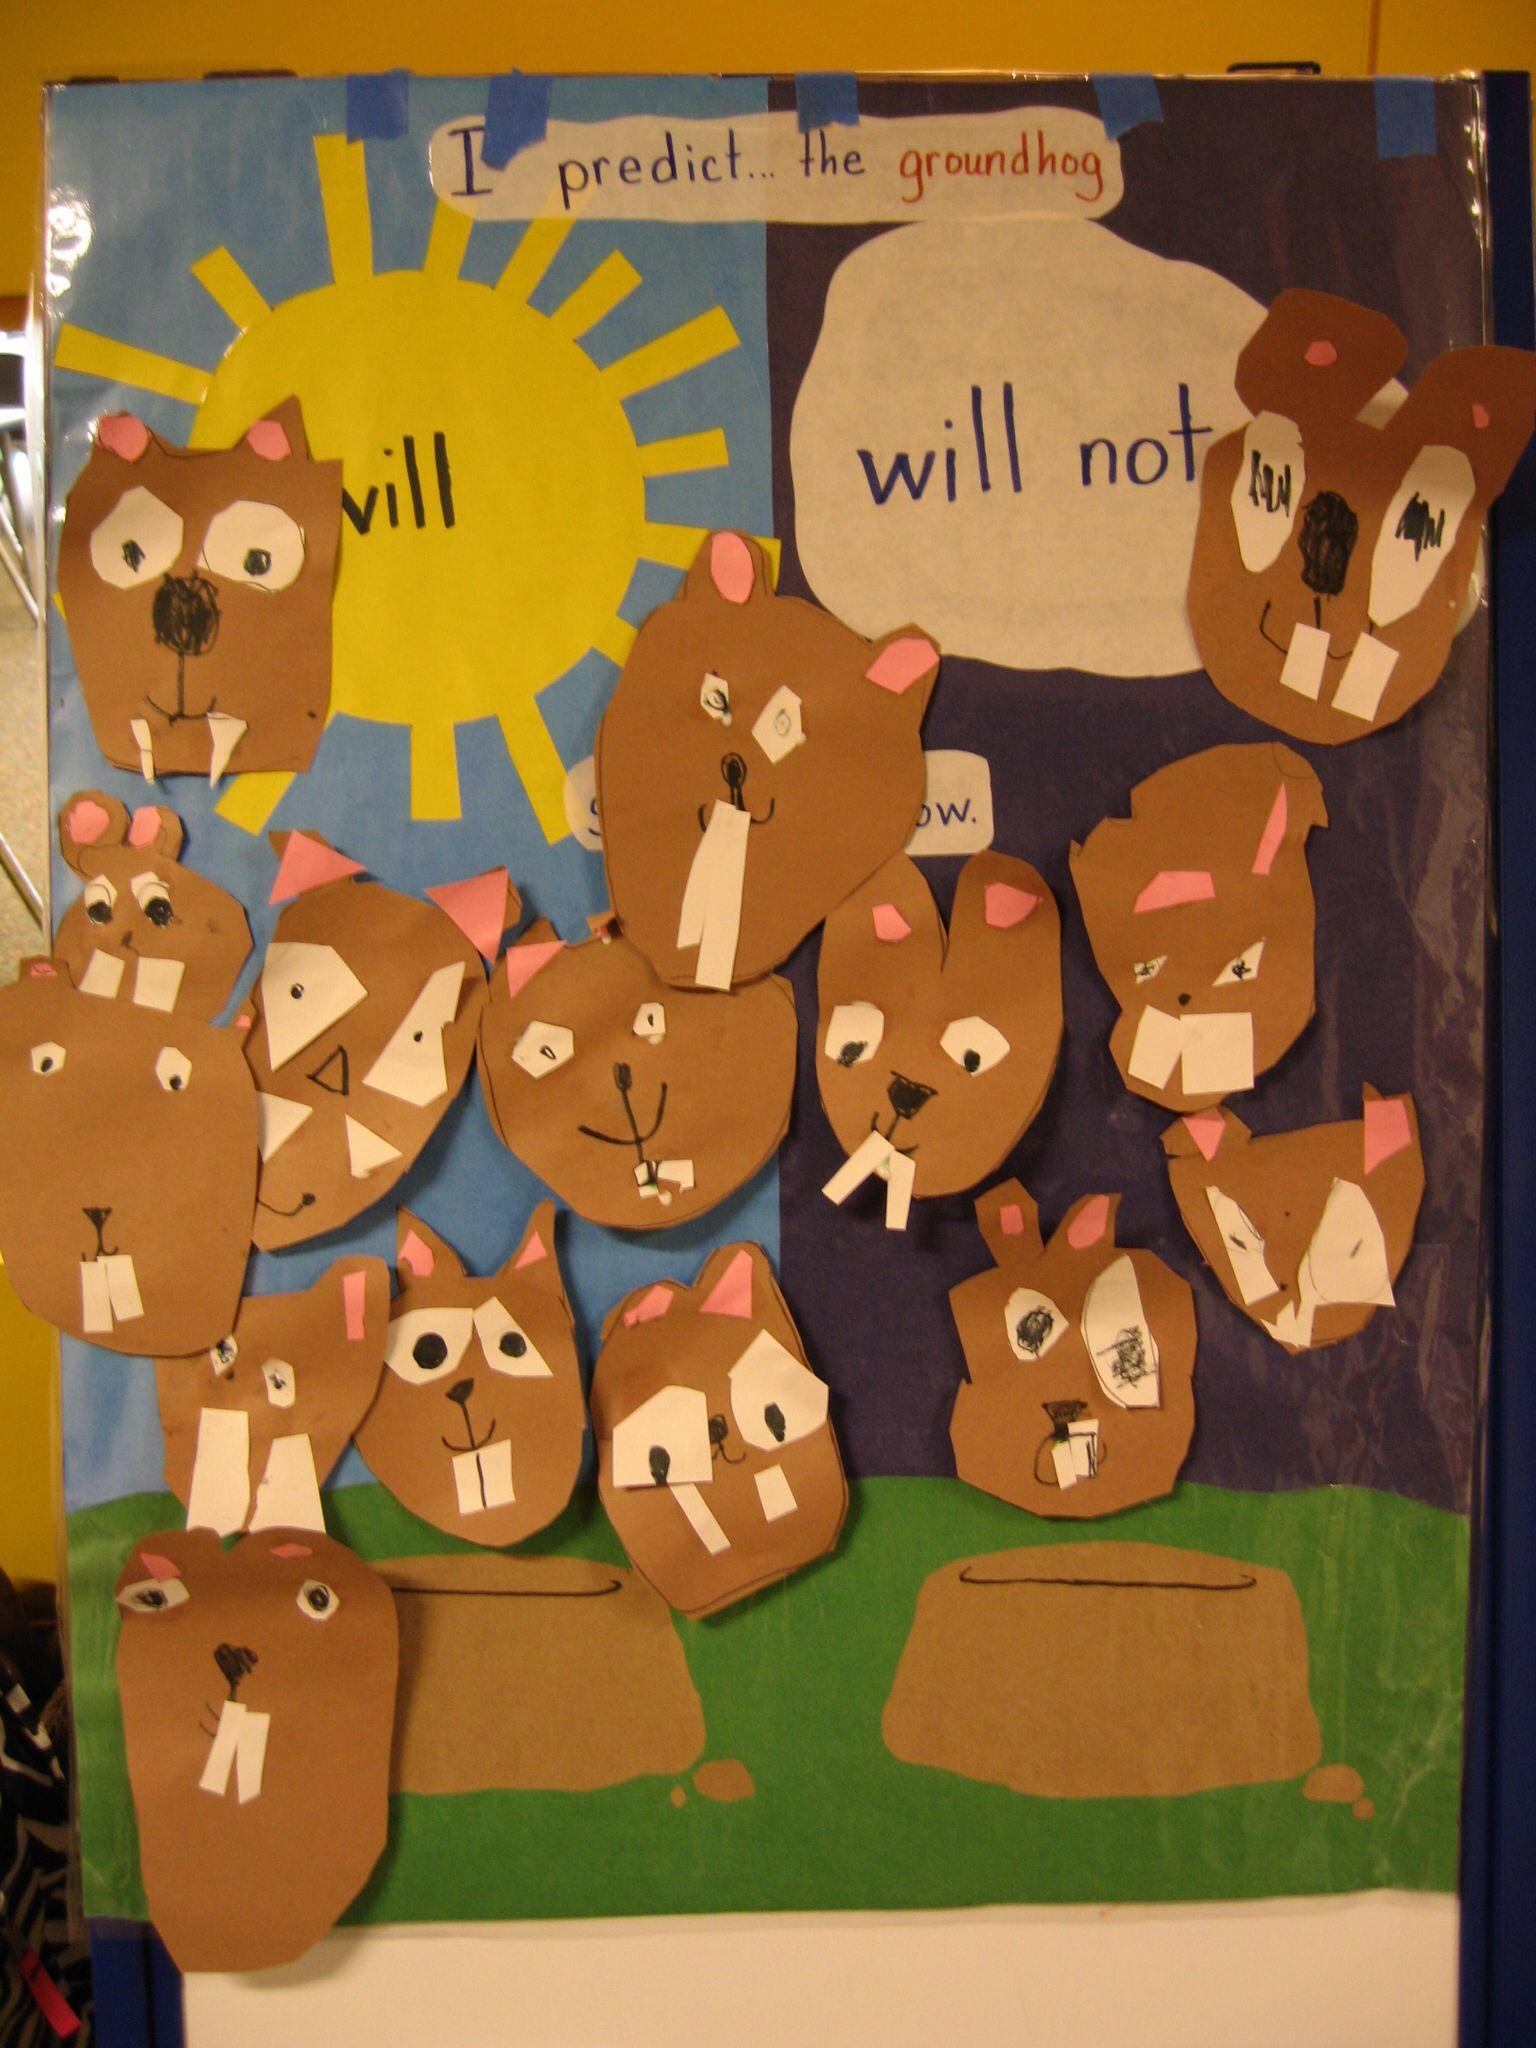 Pre K Preschool Groundhog Craft And Guessing Prediction